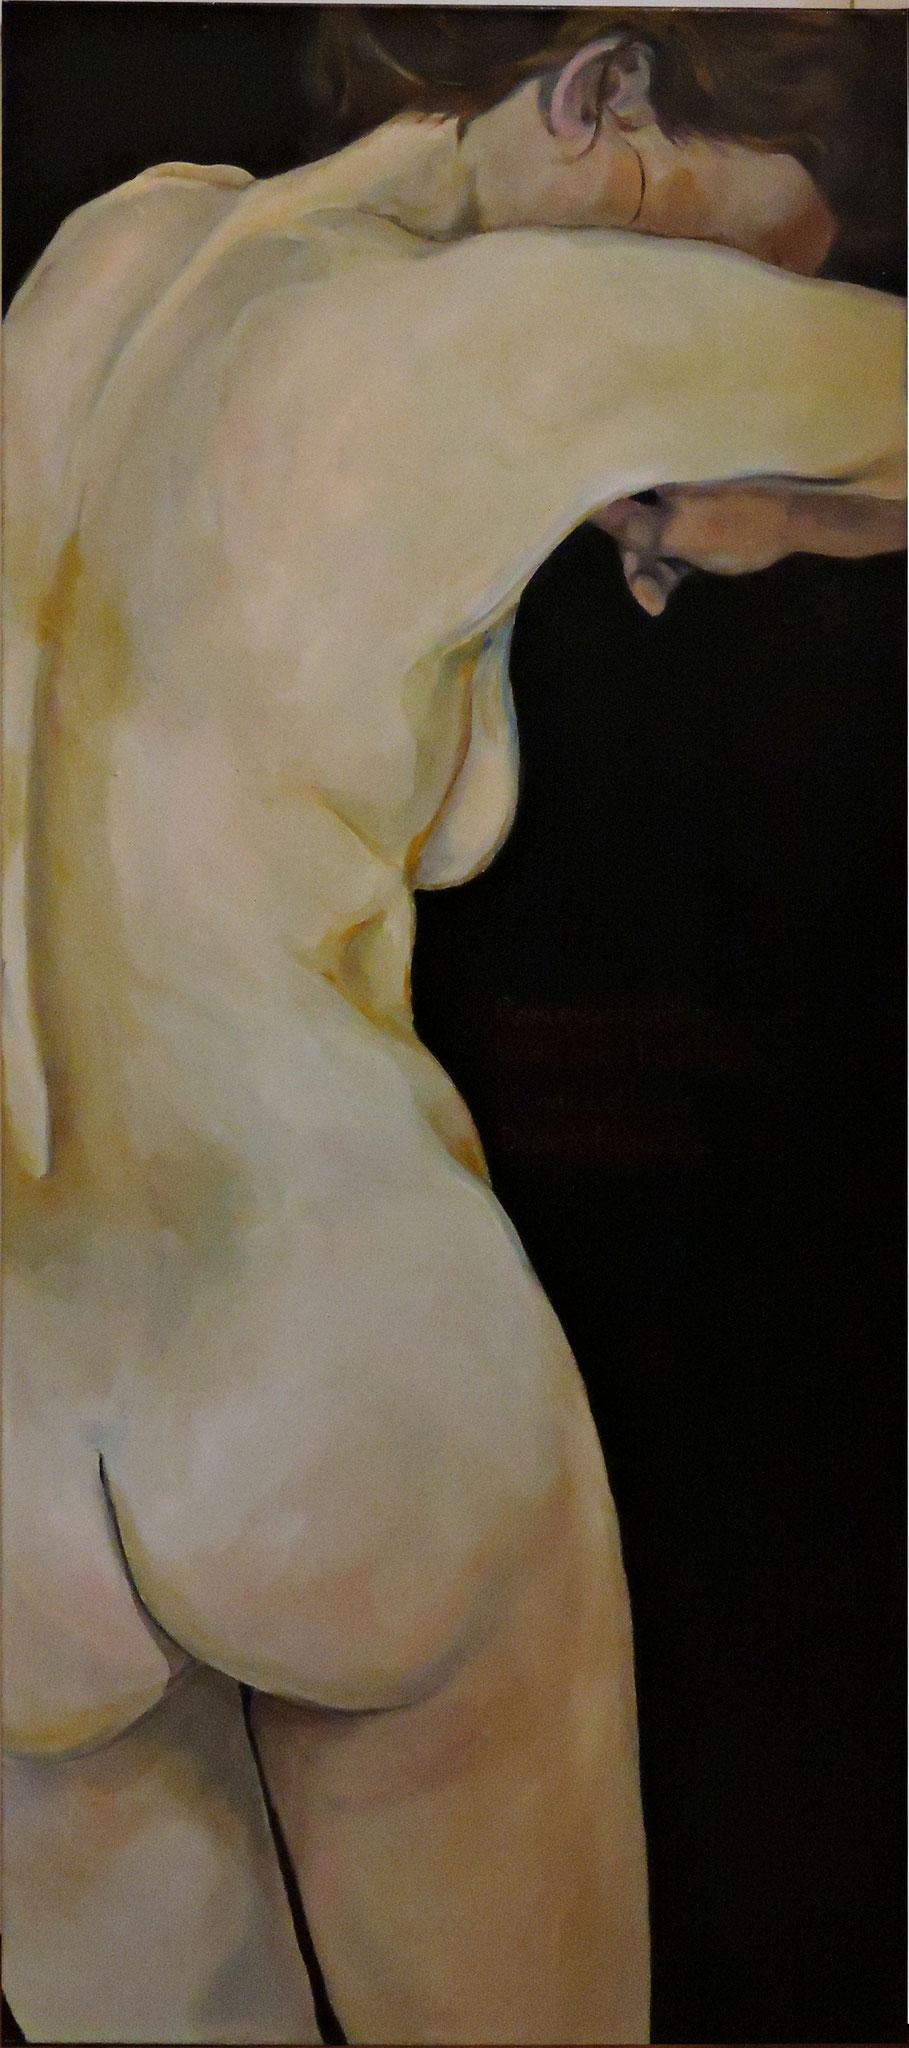 """Nausikaa"", Öl auf Leinwand, 140 x 60 cm, 2014.  3100,00 € (inkl.MwSt.)"